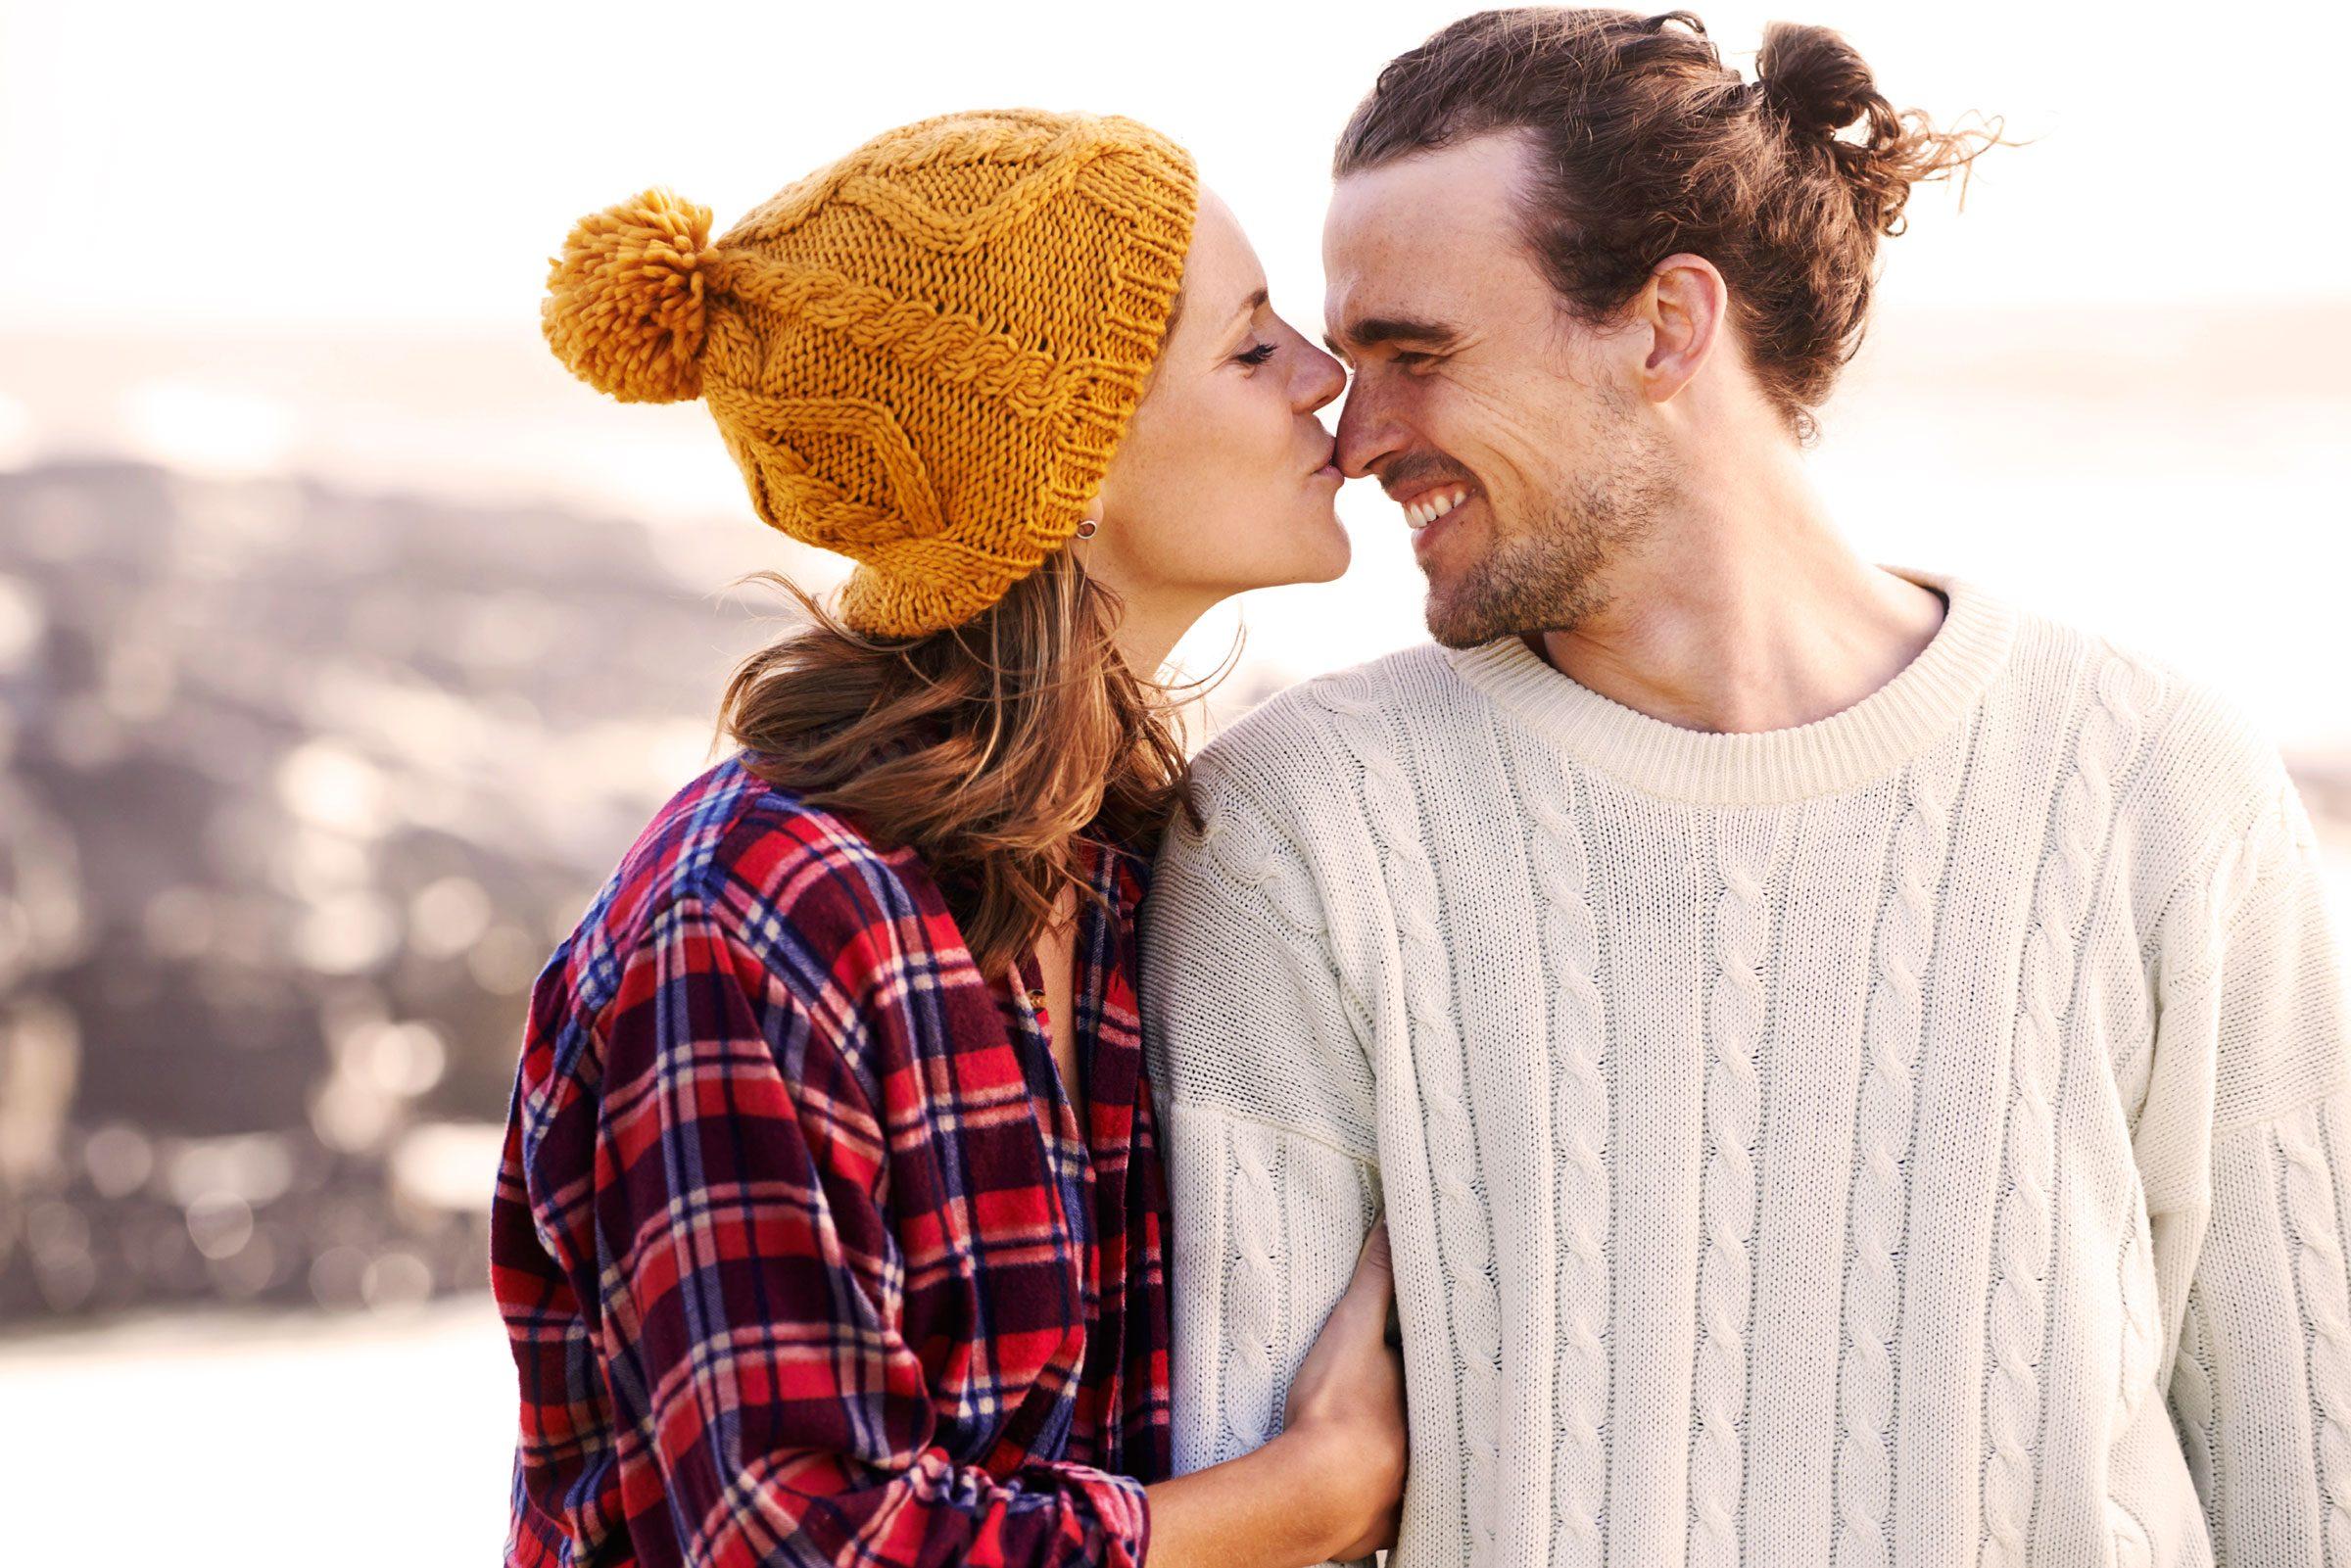 1. Kissing boosts immunity.